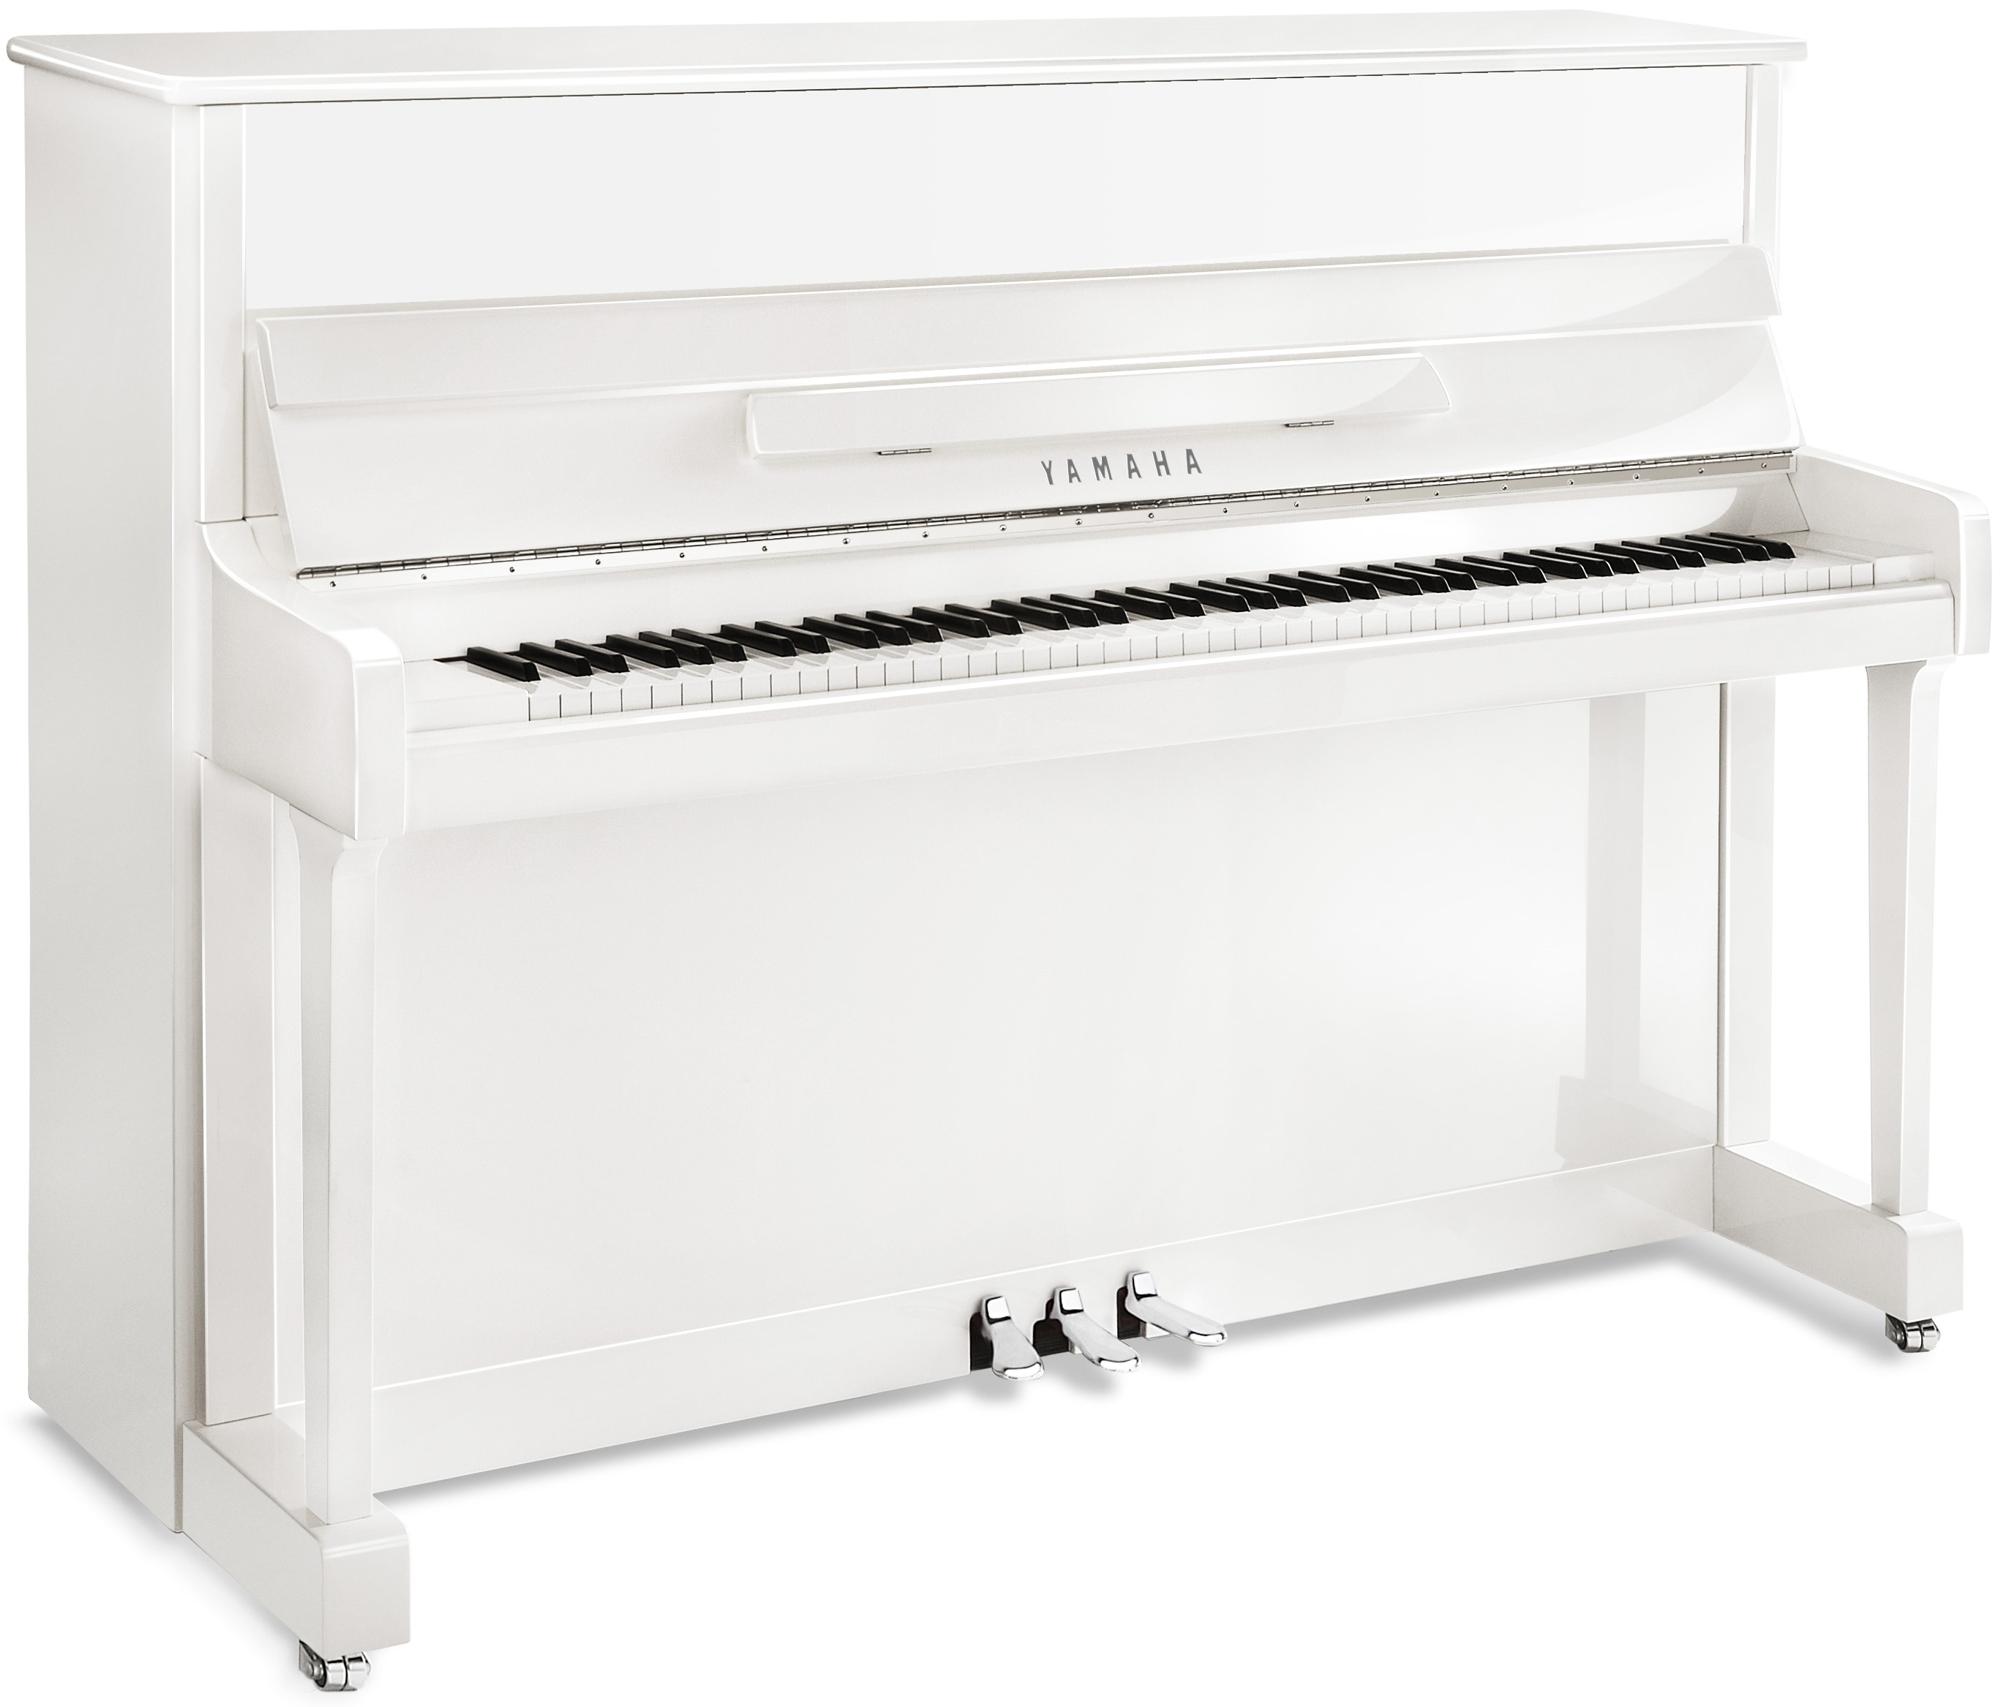 yamaha p116 m klavier chrom beschl ge limitiert. Black Bedroom Furniture Sets. Home Design Ideas